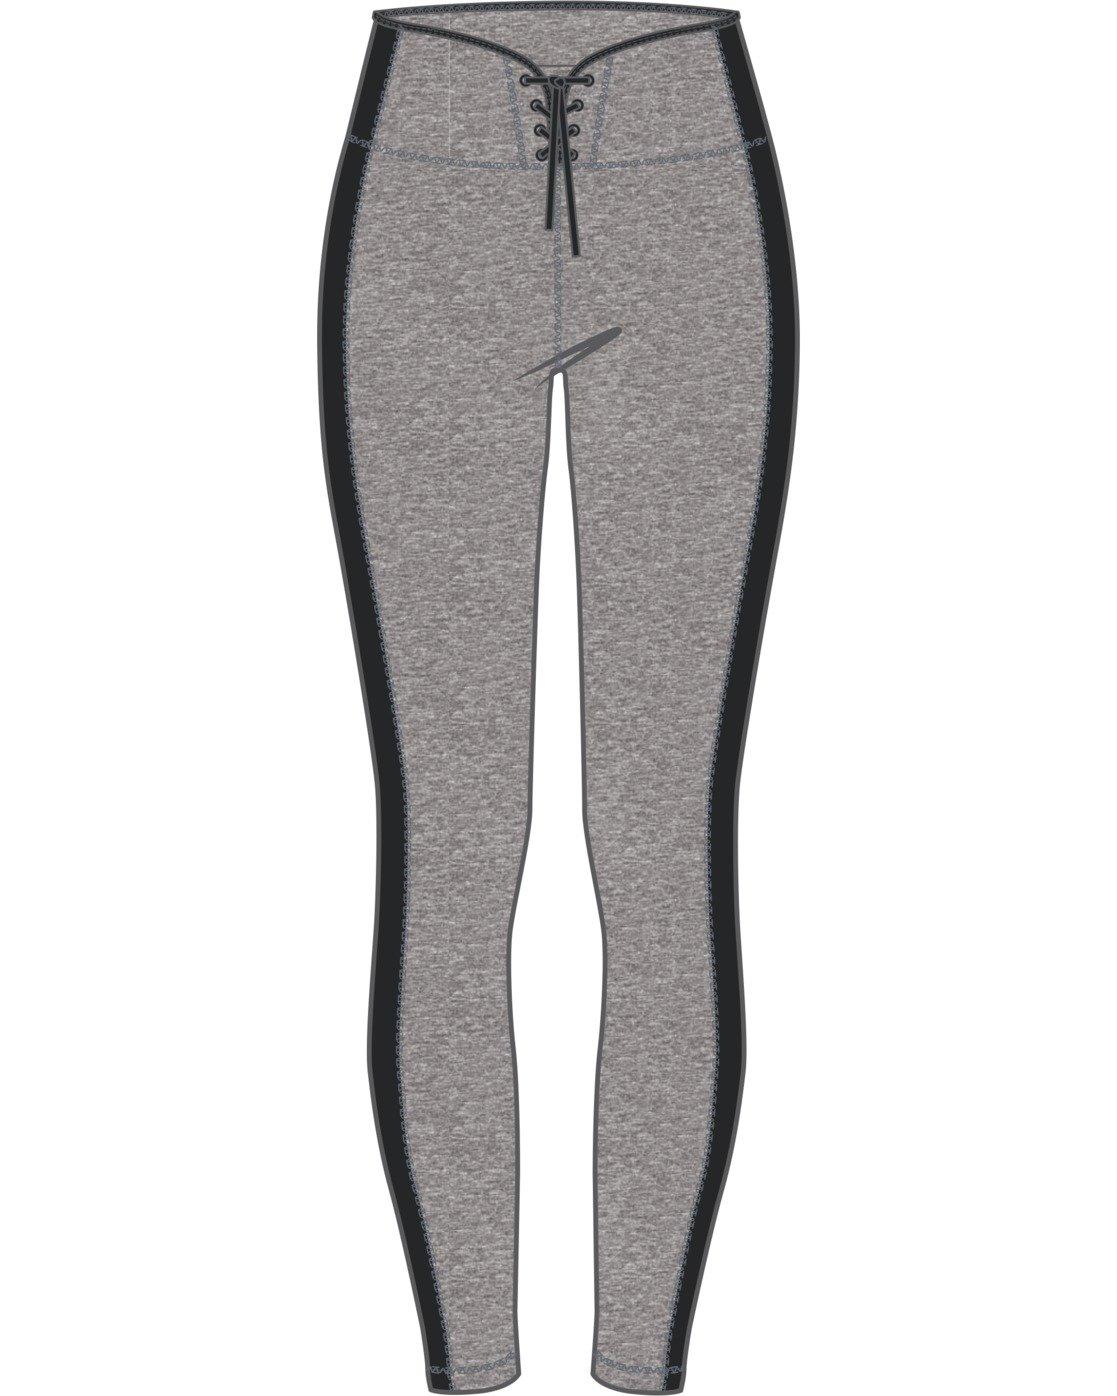 7 Everlast x RVCA Lace Up - High Waist Sports Leggings for Women Grey W4PTWDRVP1 RVCA